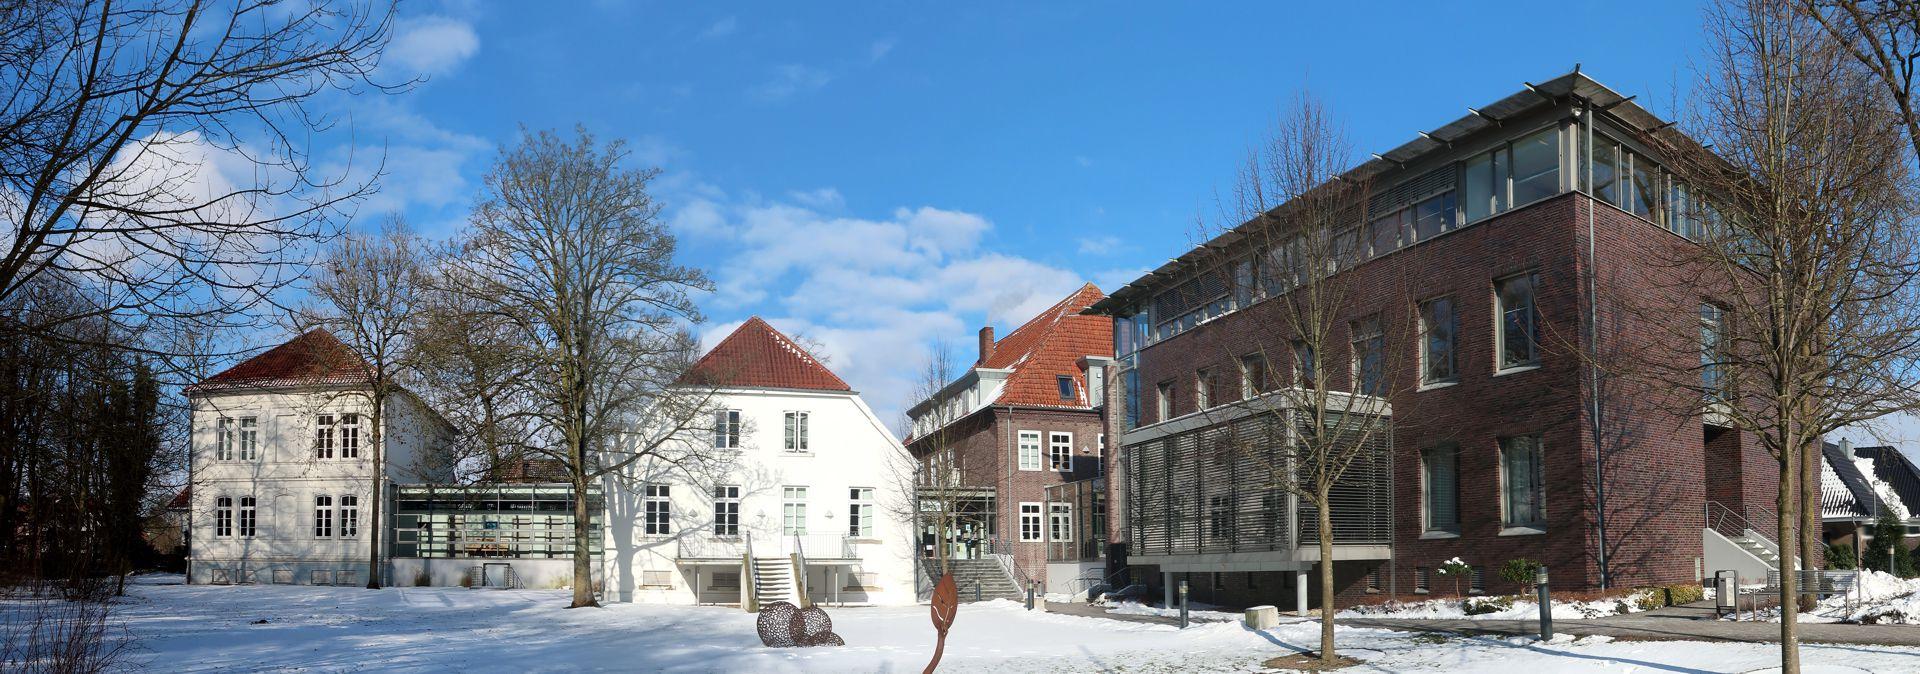 Stadt Friesoythe Winter